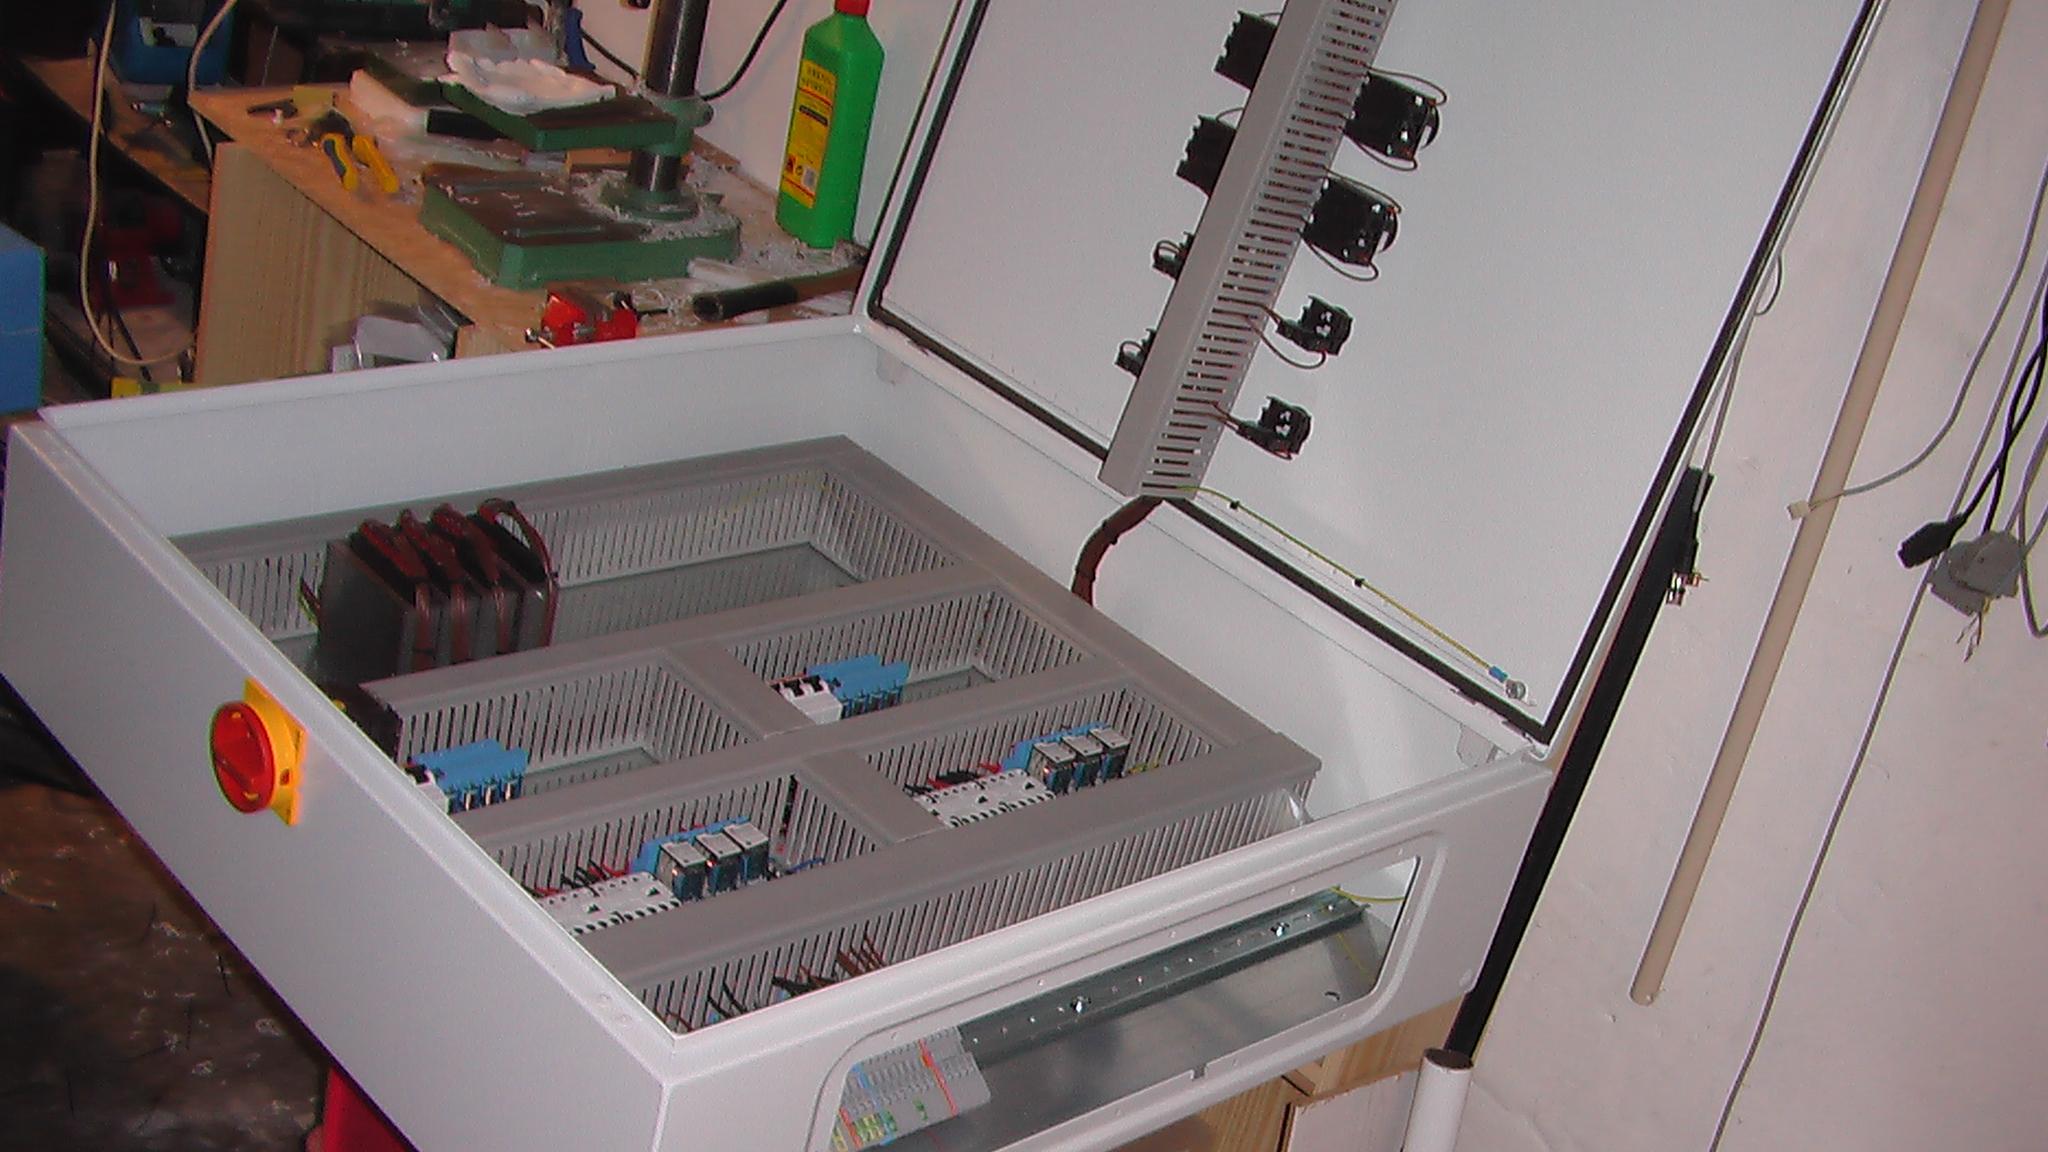 Zuleitung zum Schaltschrank - Mikrocontroller.net